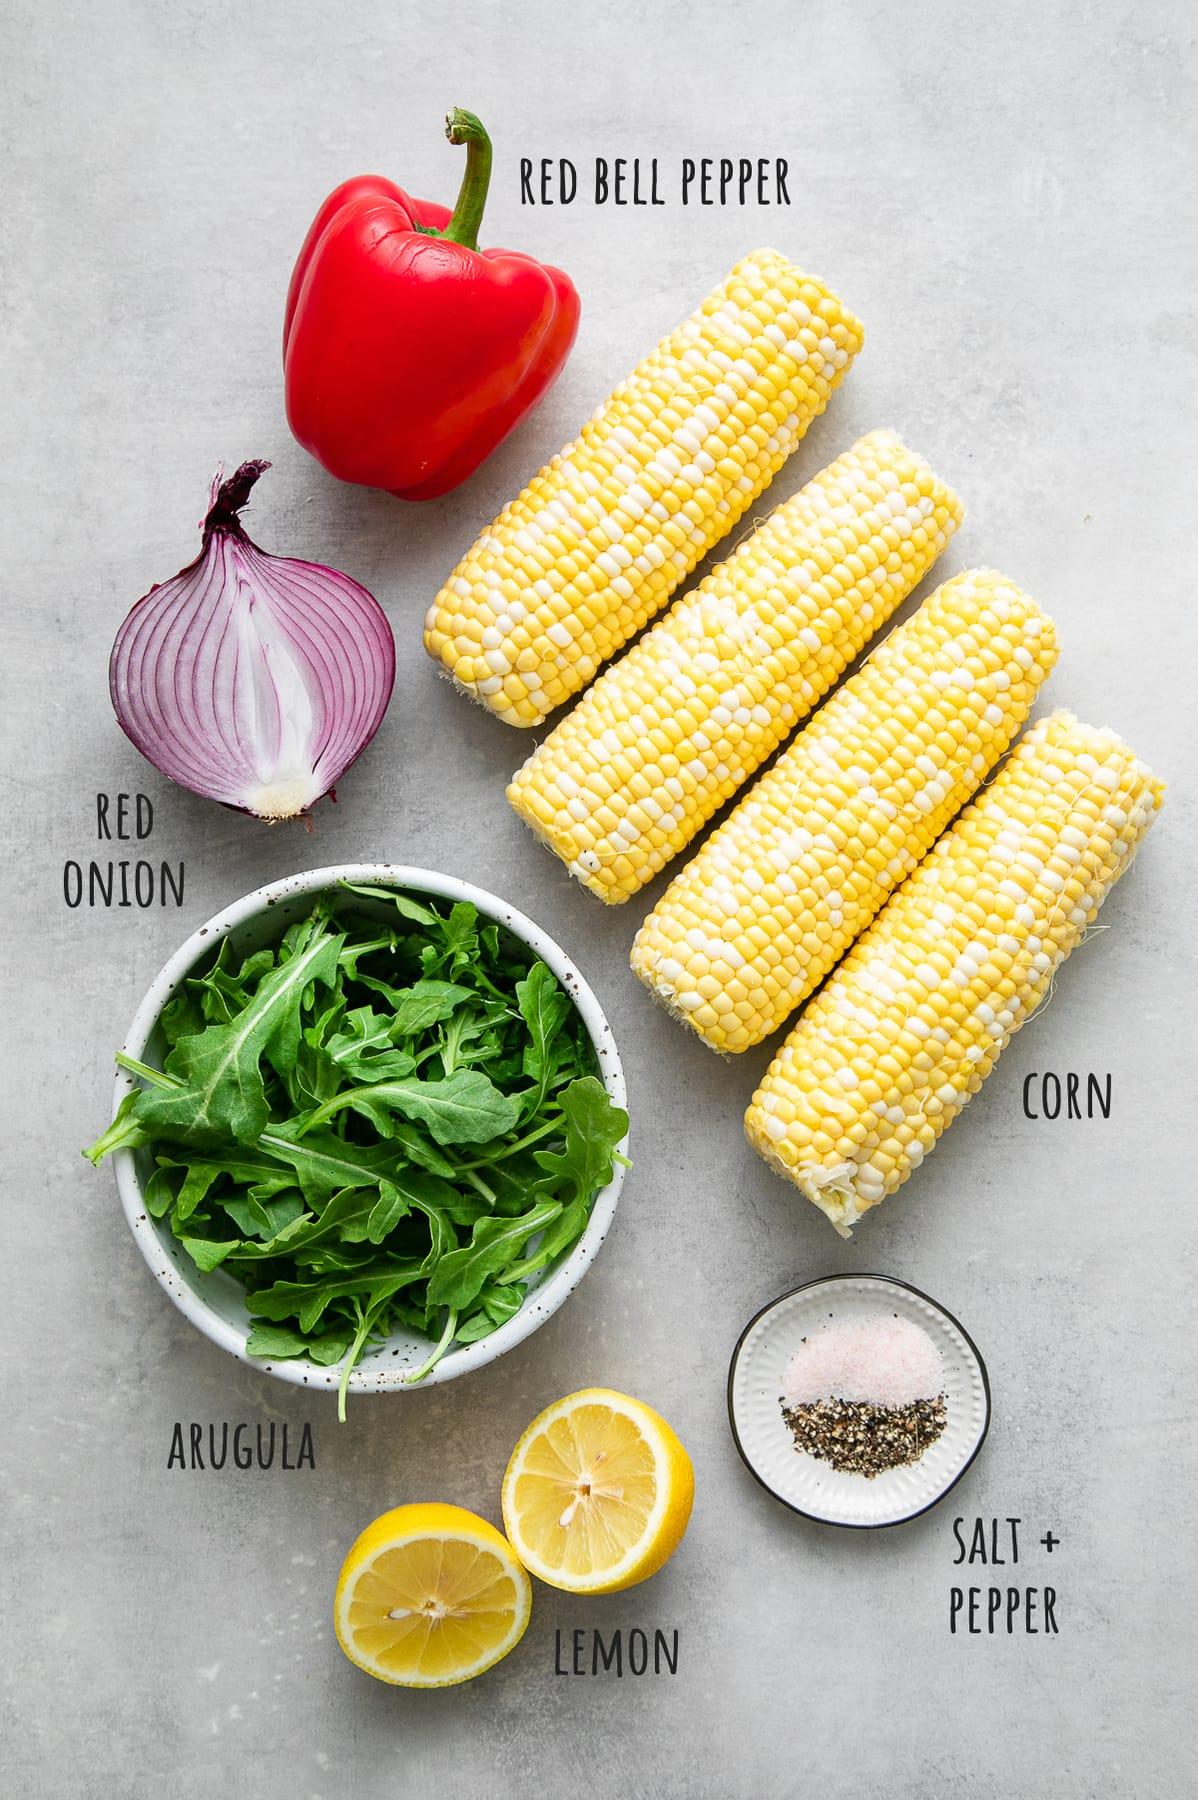 top down view of ingredients used to make corn arugula salad recipe.